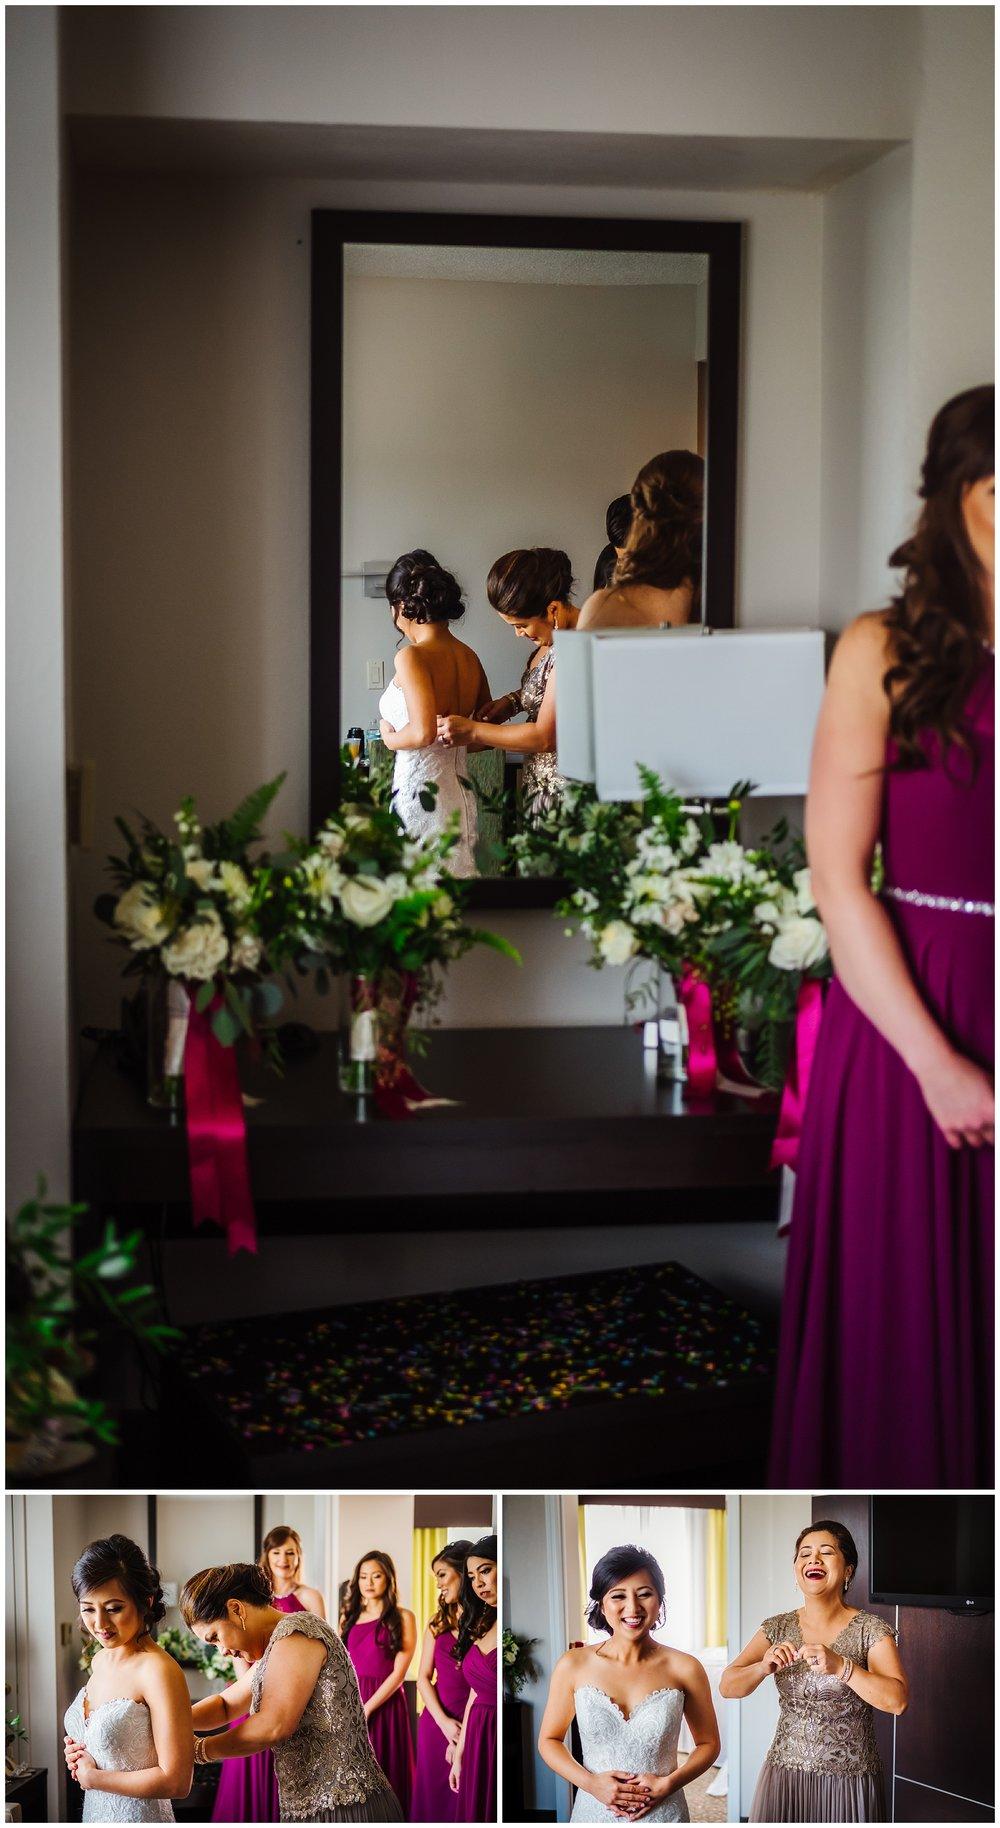 tampa-wedding-photographer-philipino-colorful-woods-ballroom-church-mass-confetti-fuscia_0011.jpg